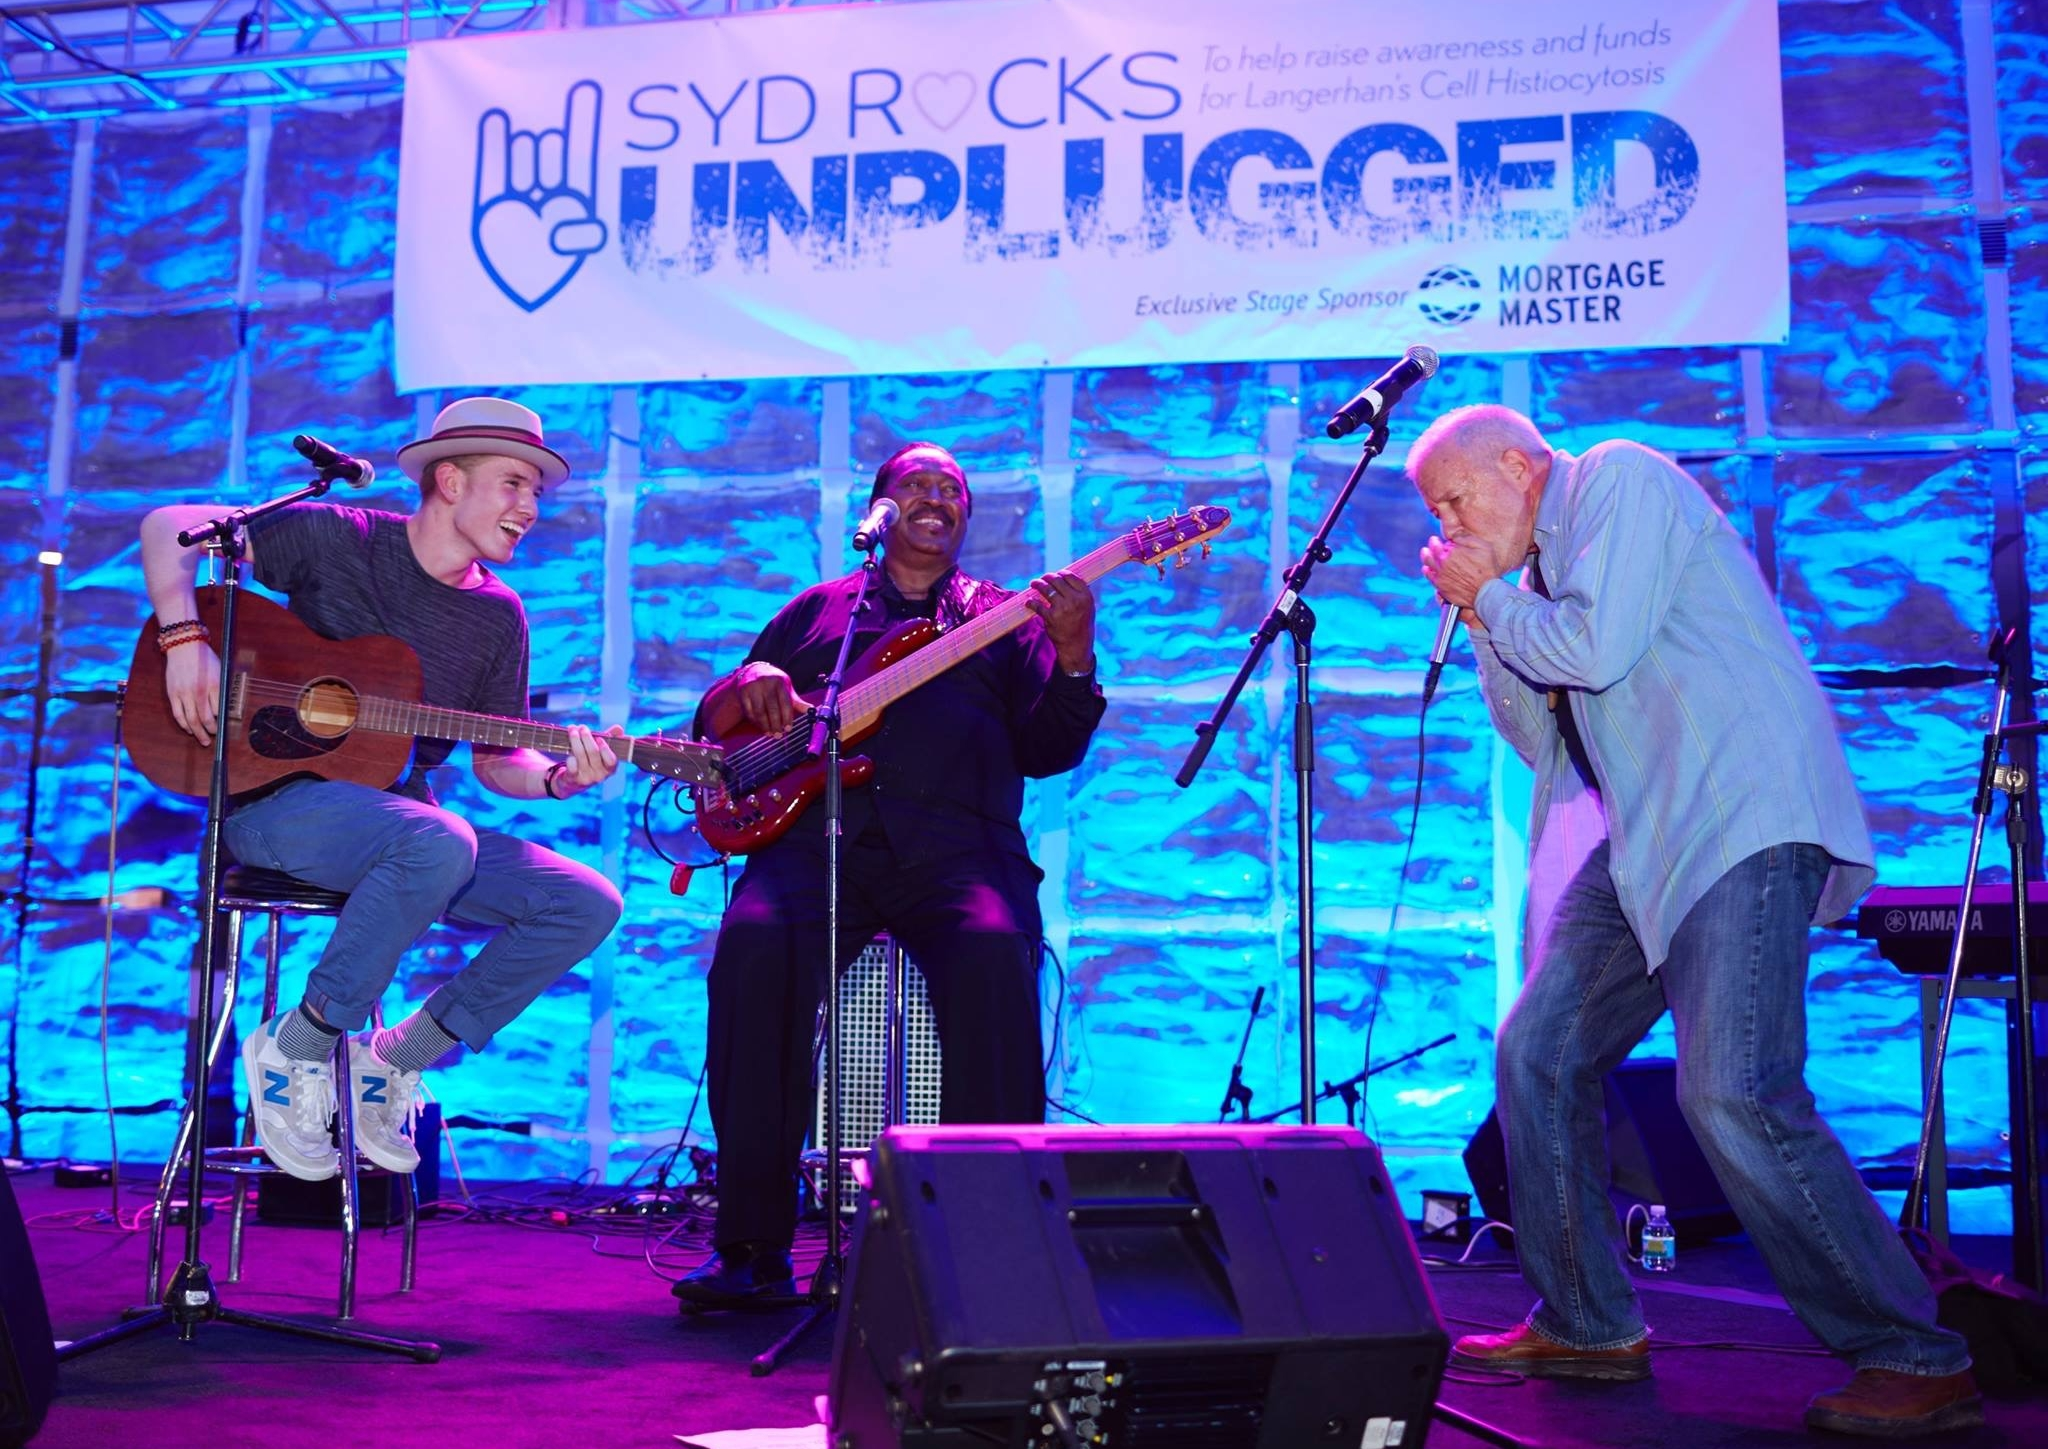 SydRocks Unplugged Fundraiser L-R Will, Felton Crews, and Corky Siegel Photo by Josh Dreyfus